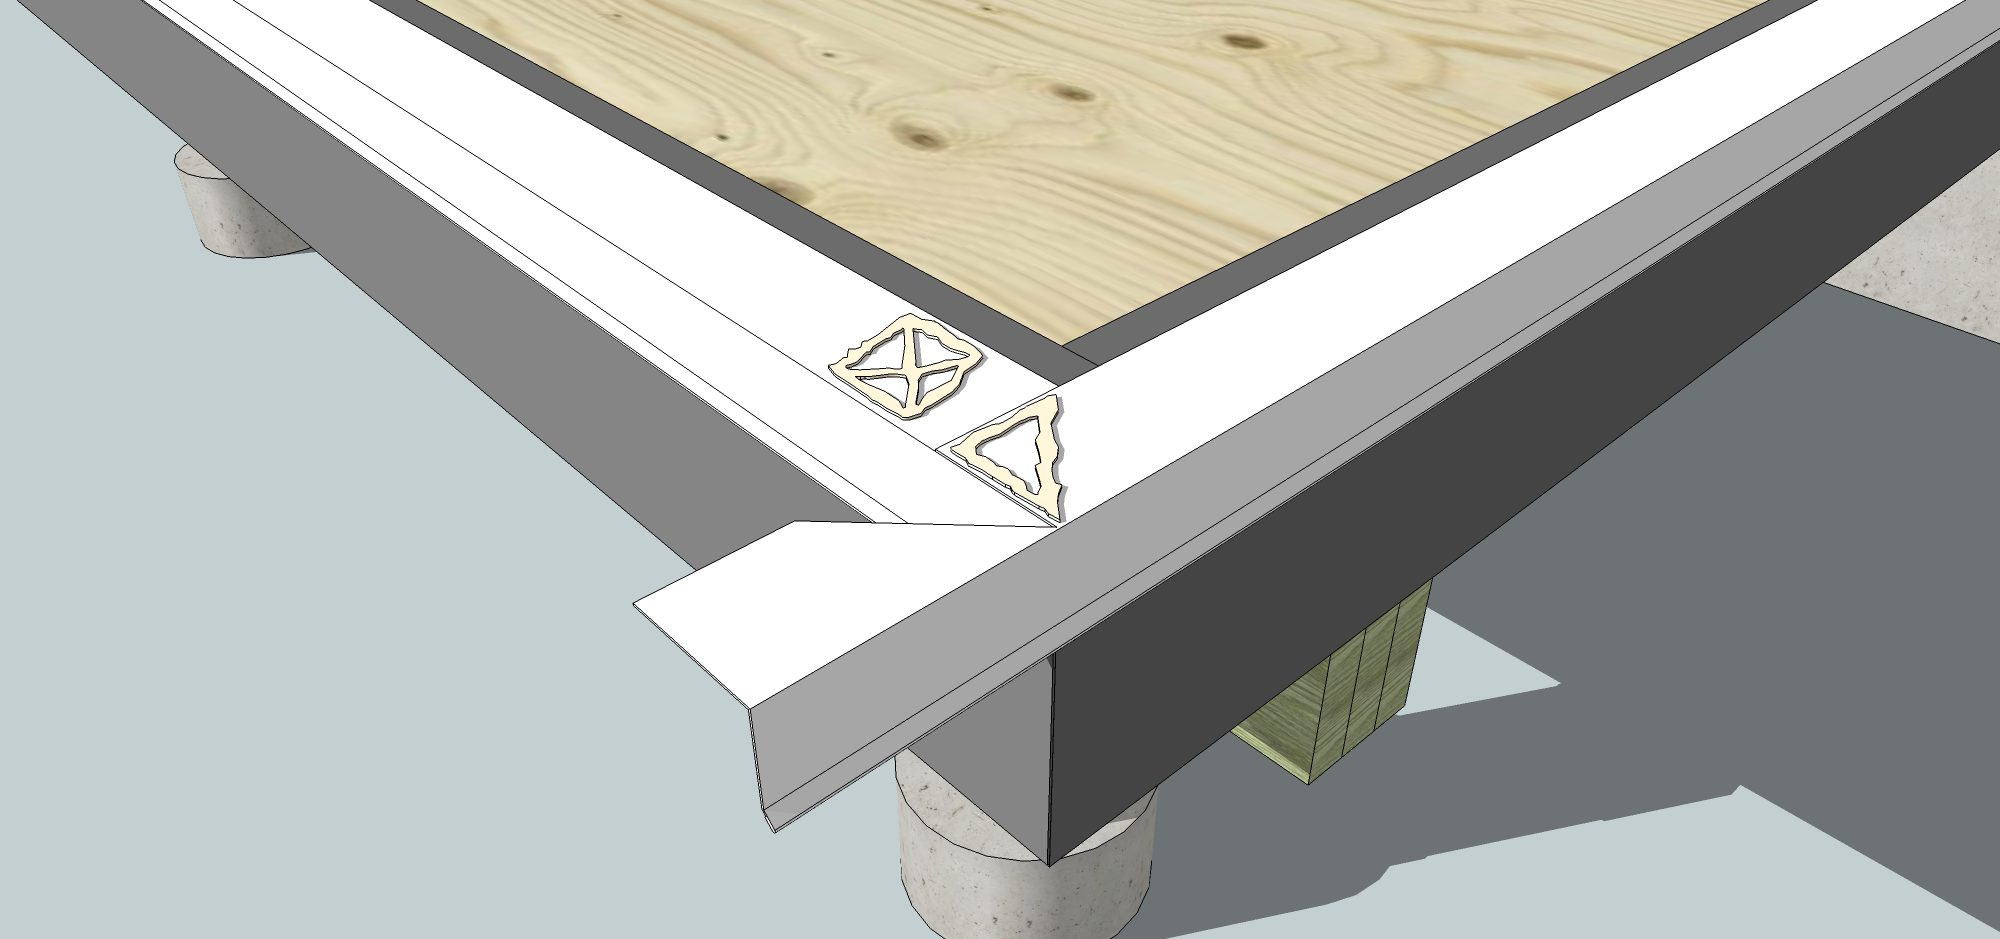 Sunroom Deck Flashing-2